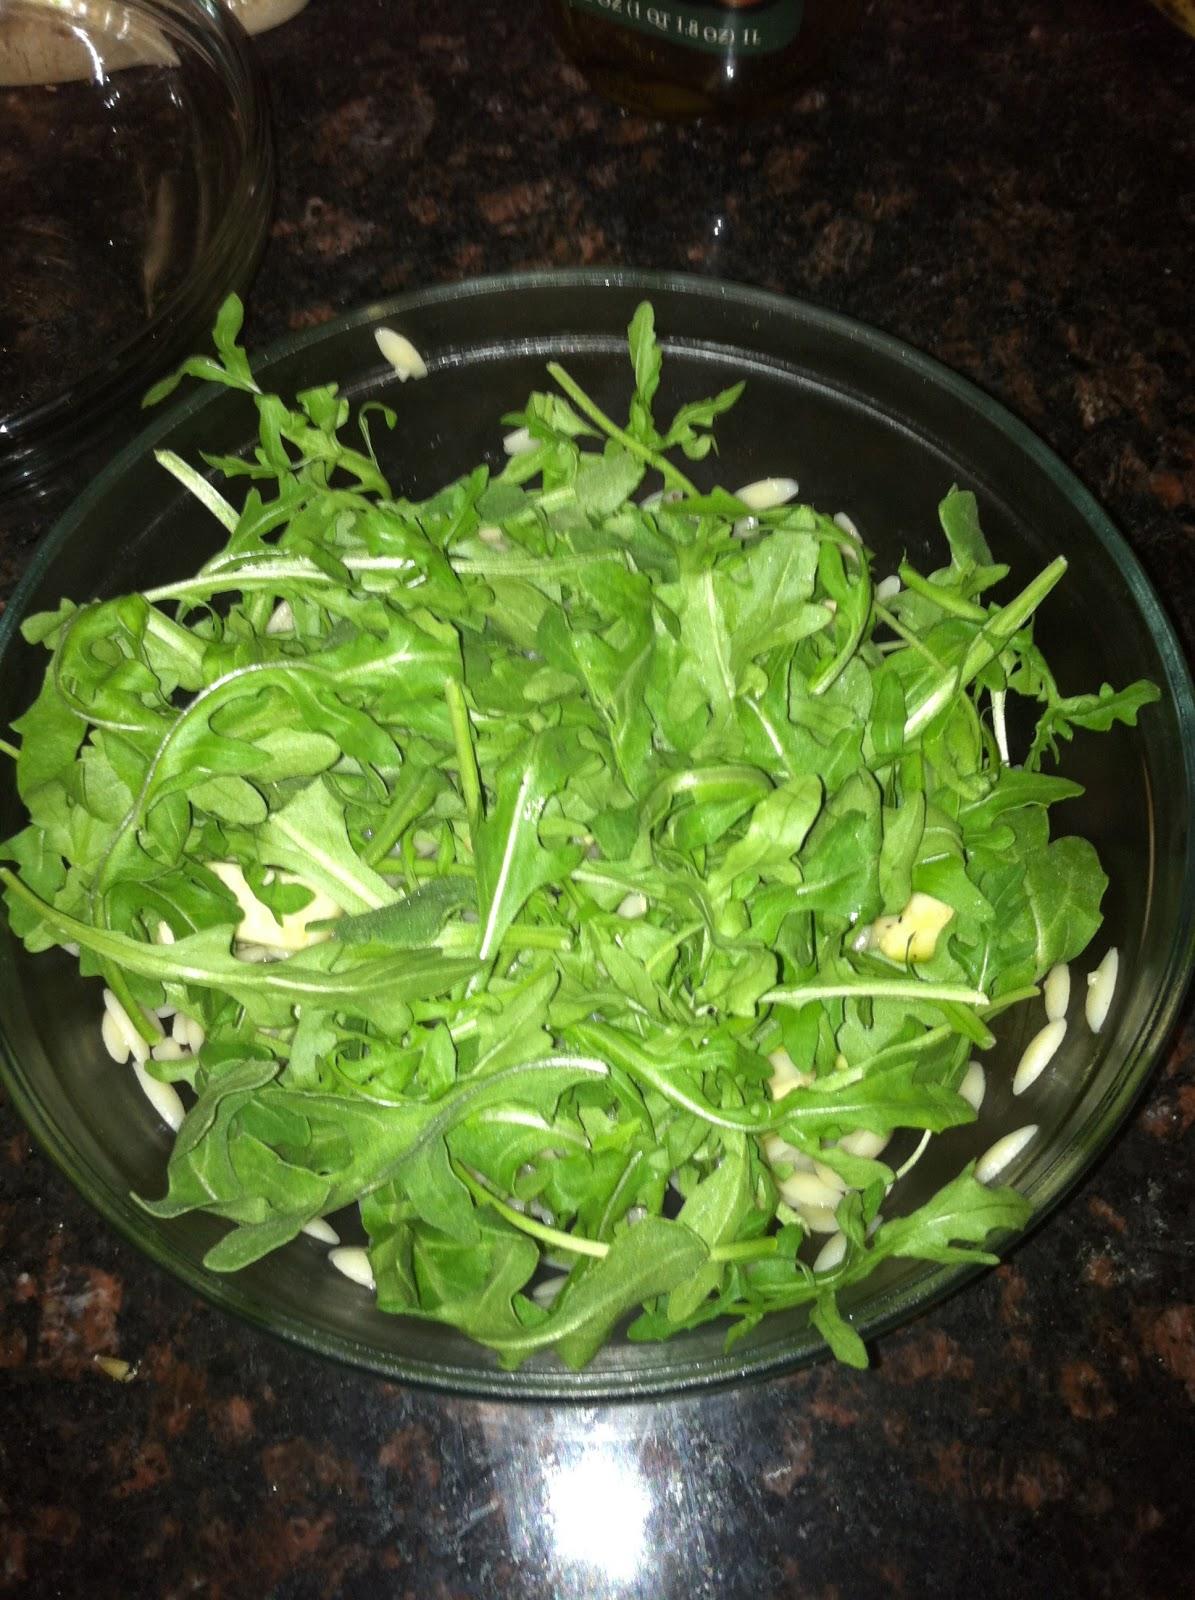 ... lemon pepper vinaigrette mixture, adding additional vinaigrette to